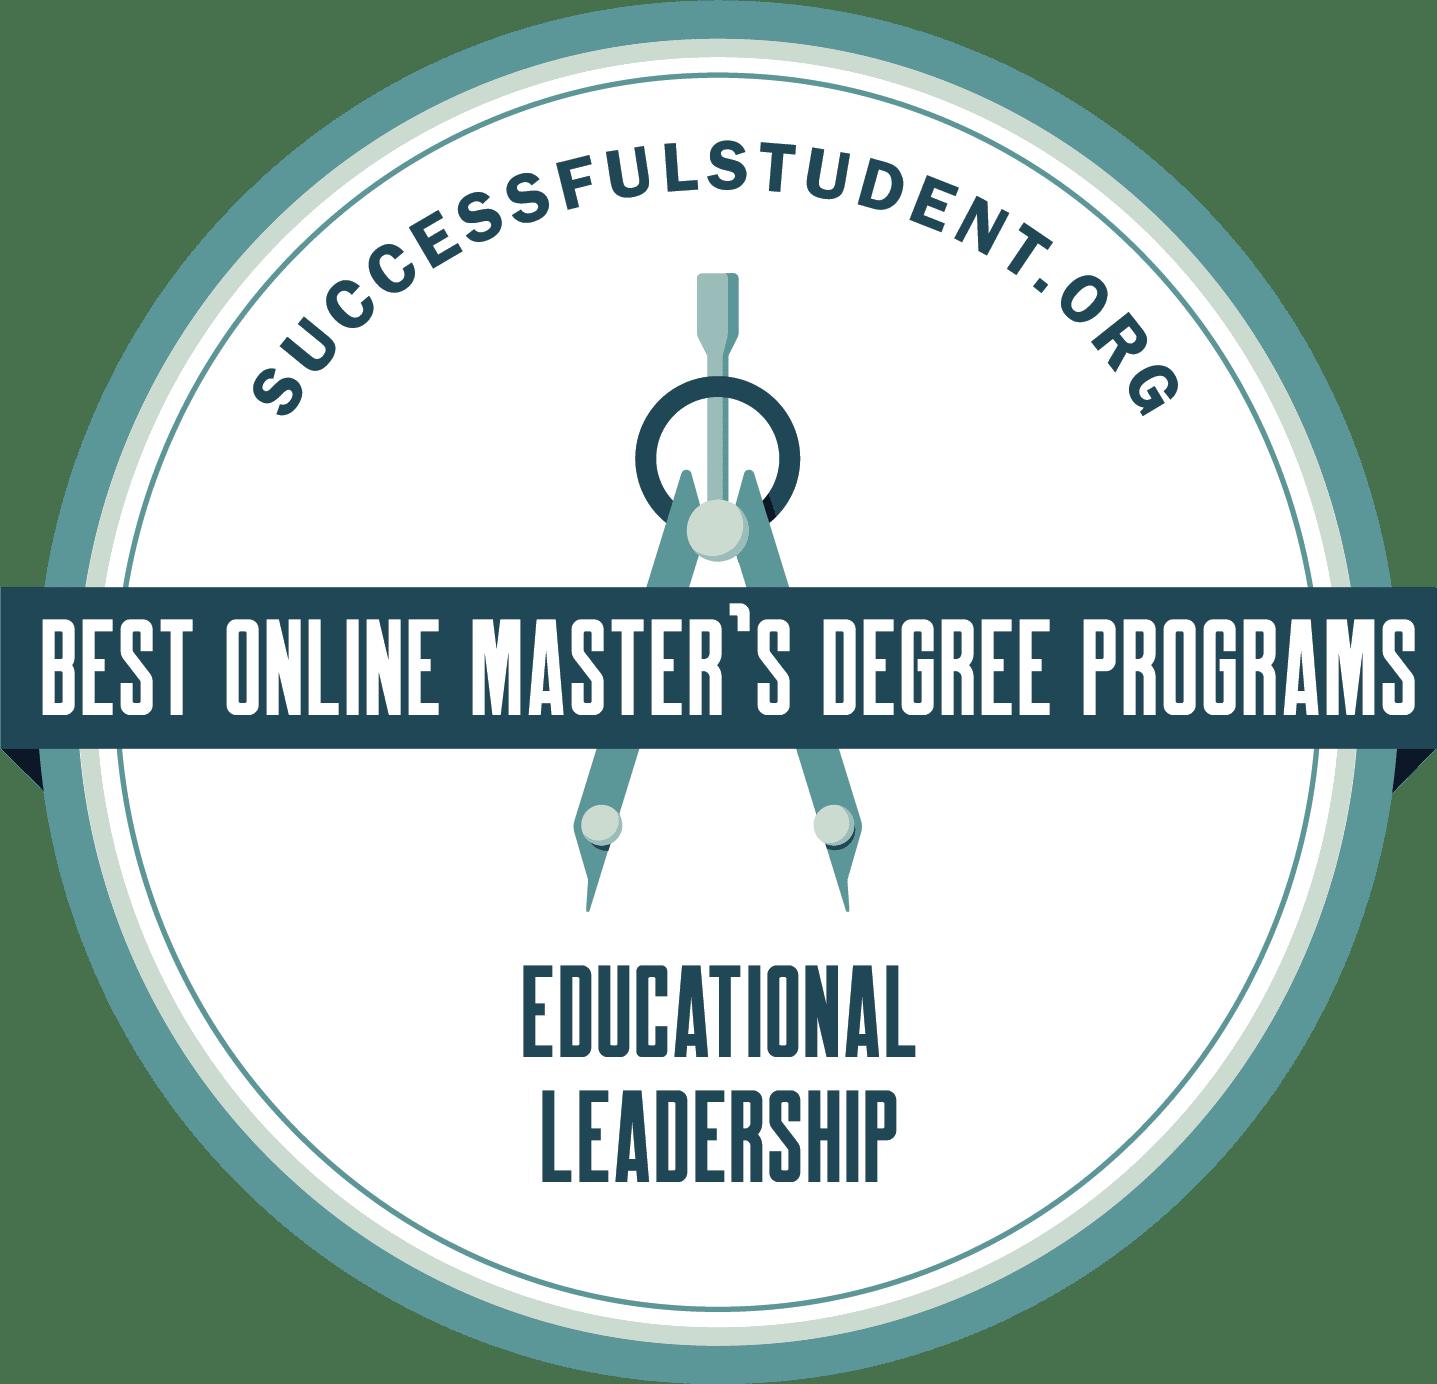 The 25 Best Online Master's in Educational Leadership Degree Programs's Badge